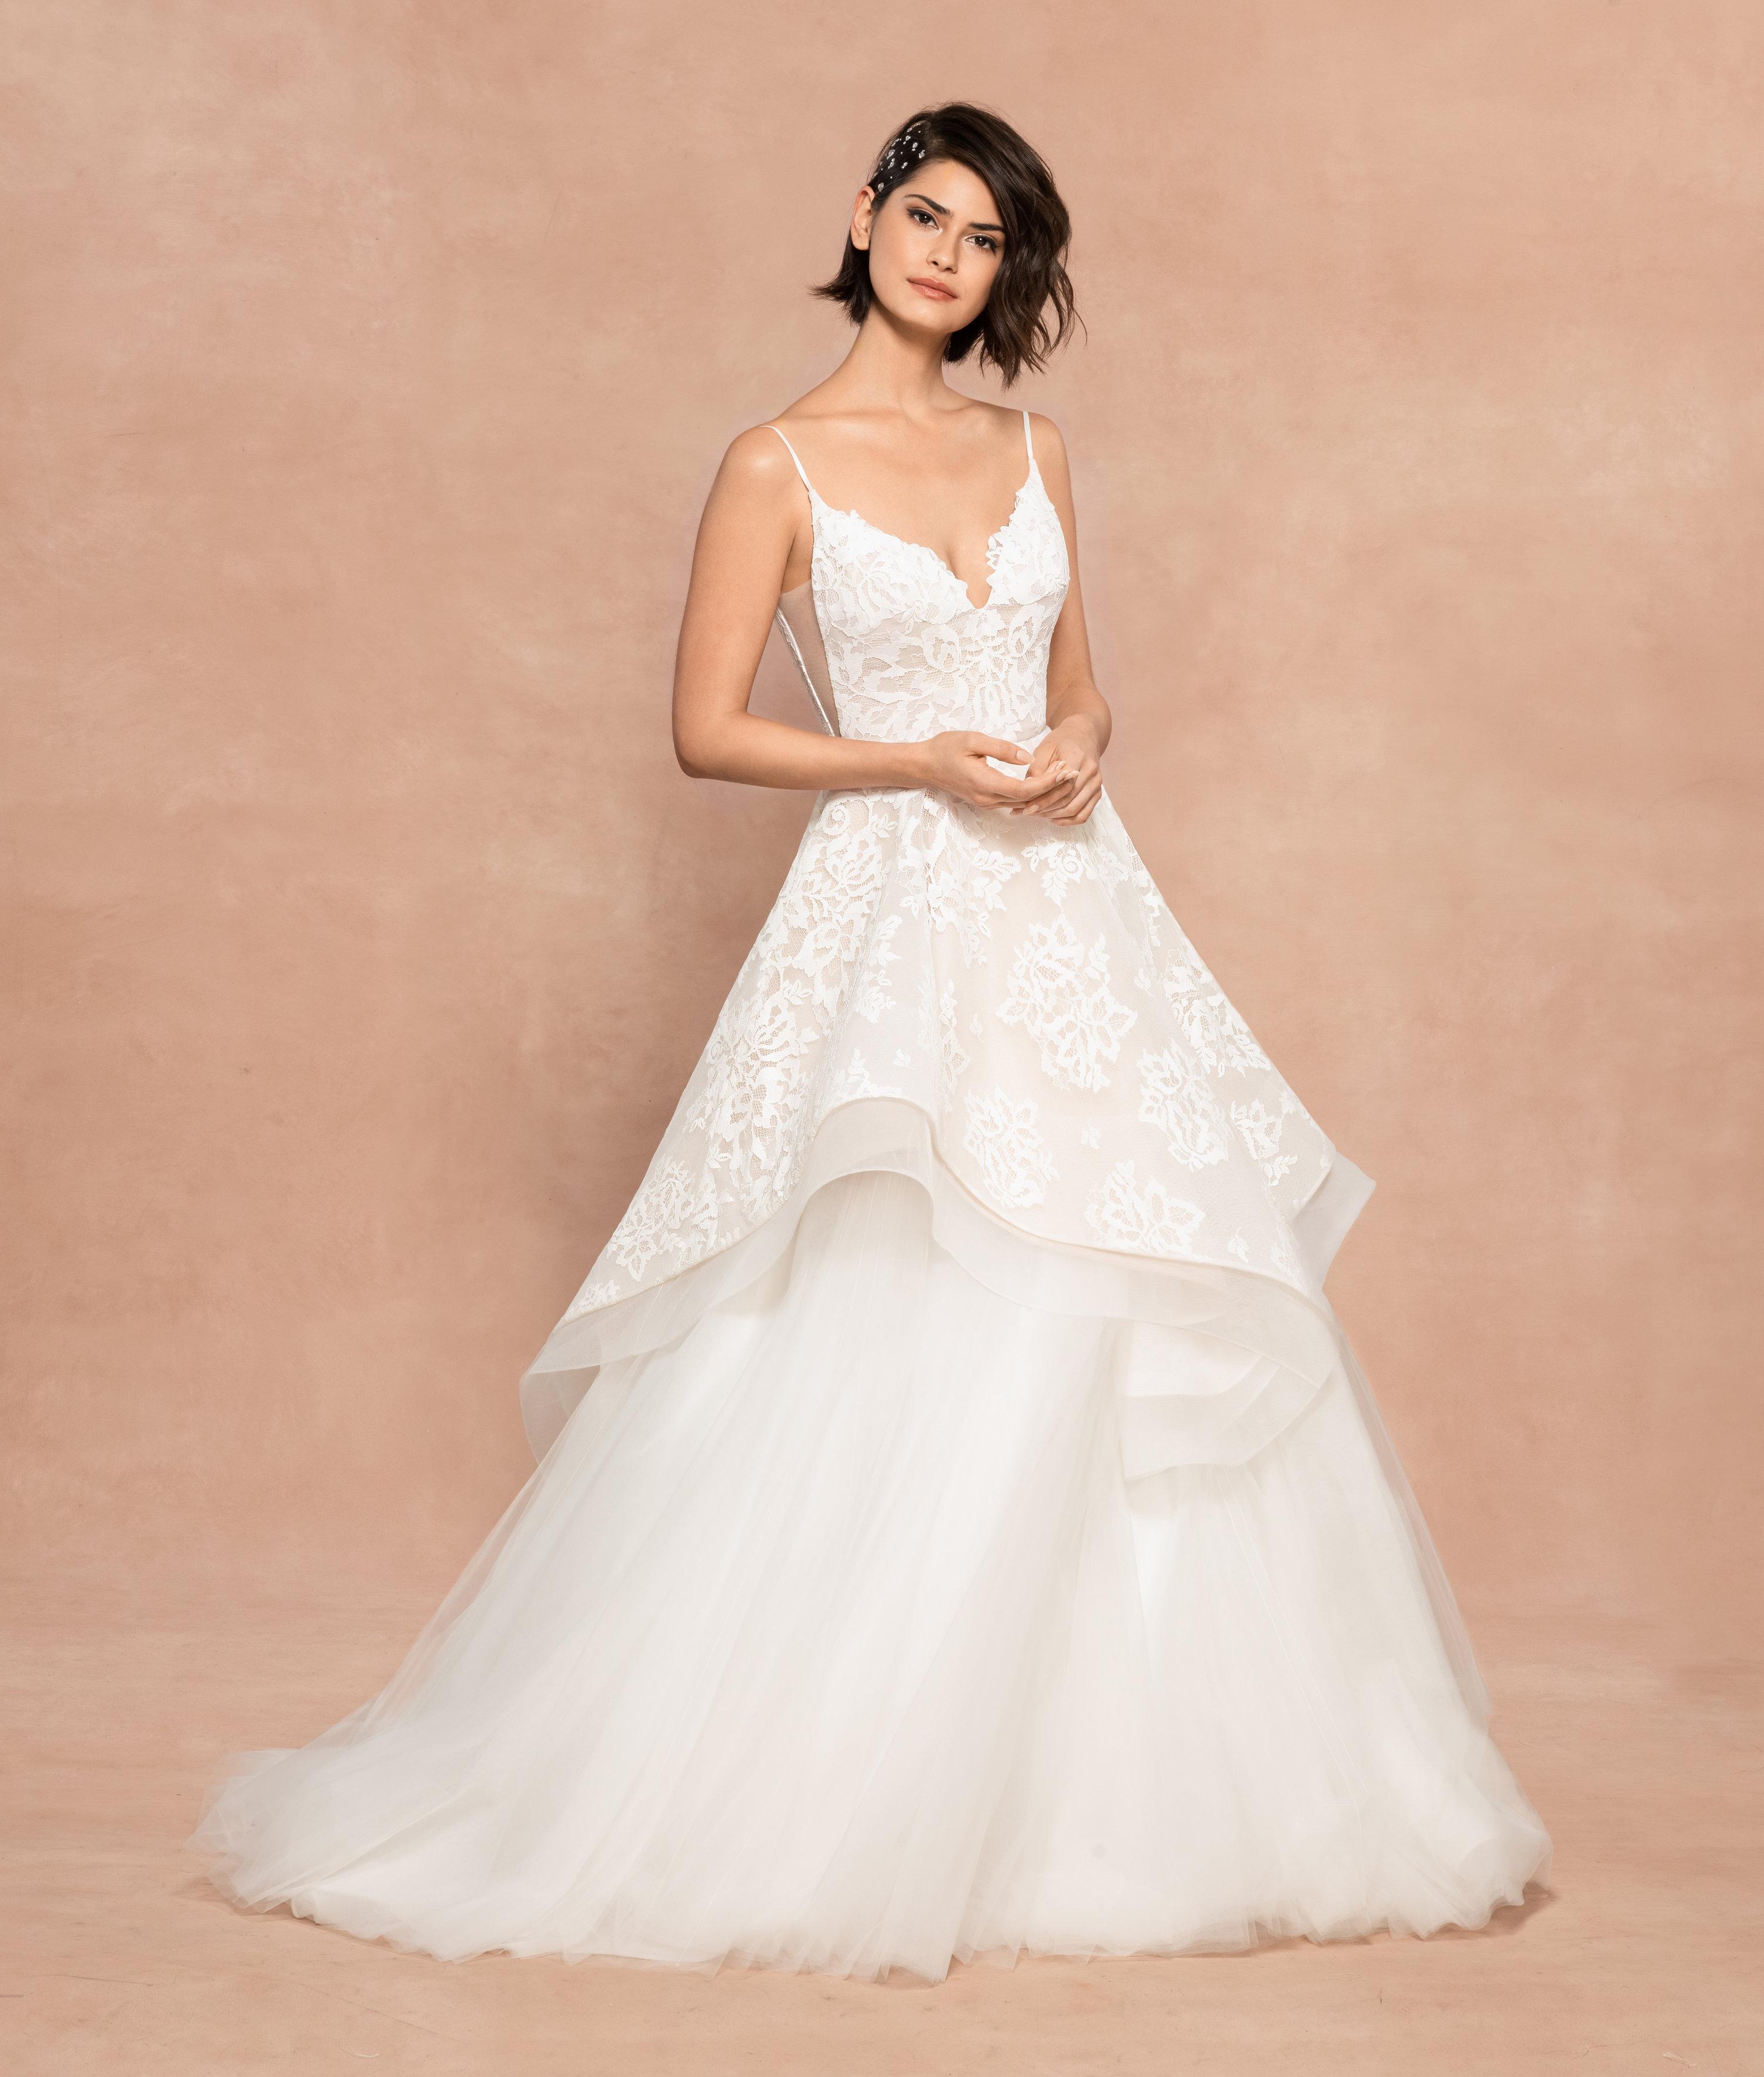 Strap A Line Lace Wedding Dress